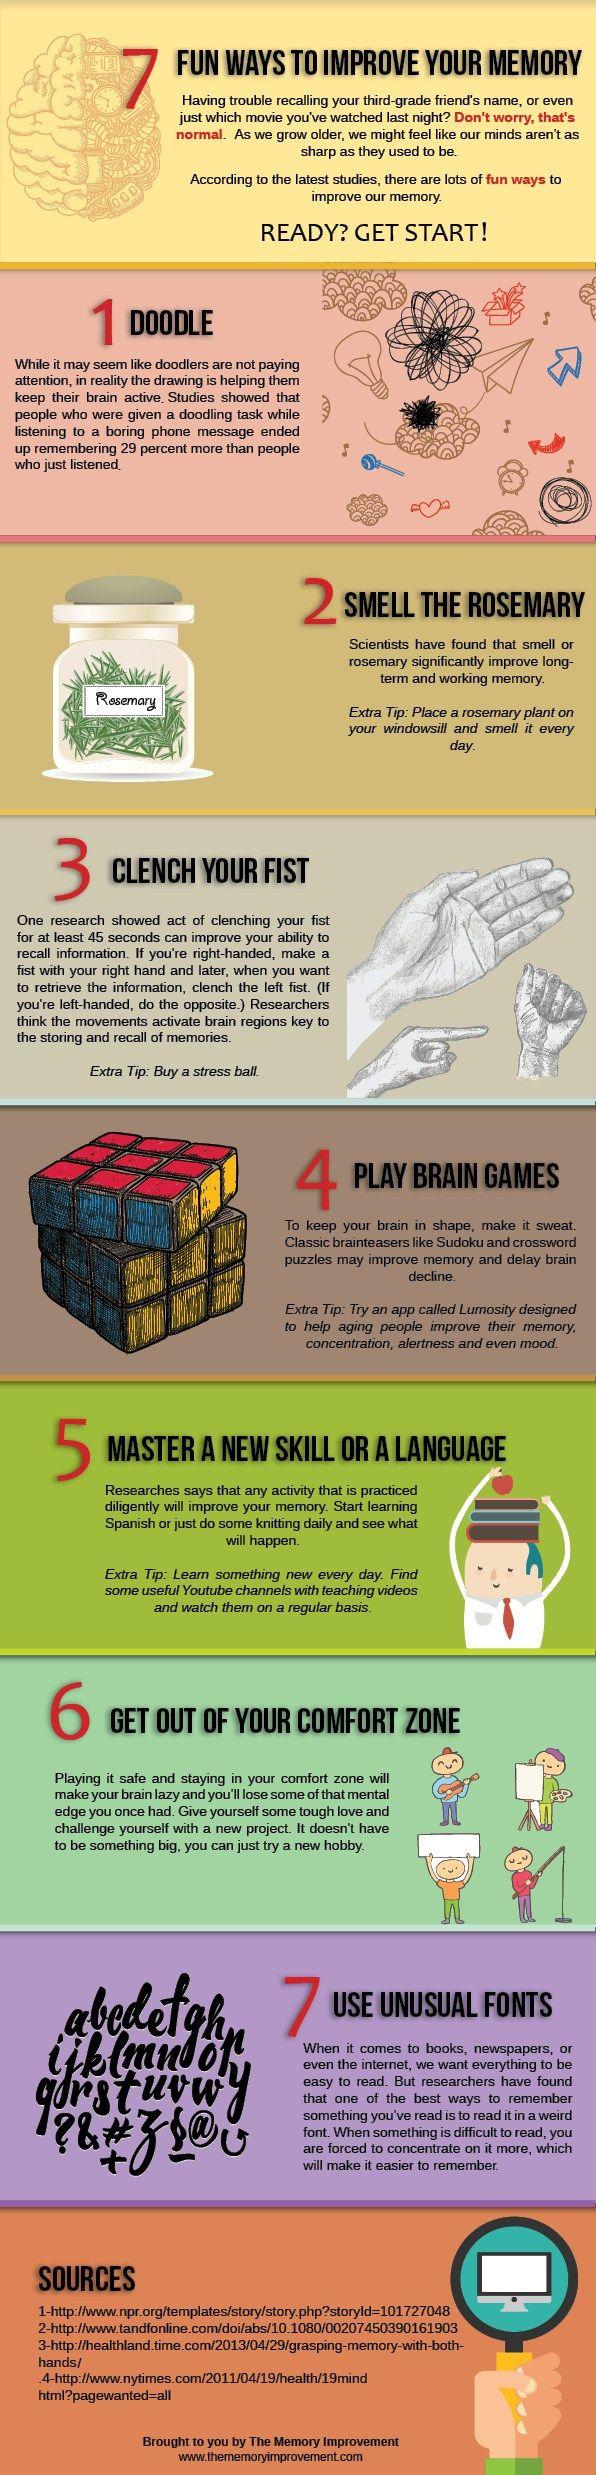 7 Easy Ways to Improve Your Memory